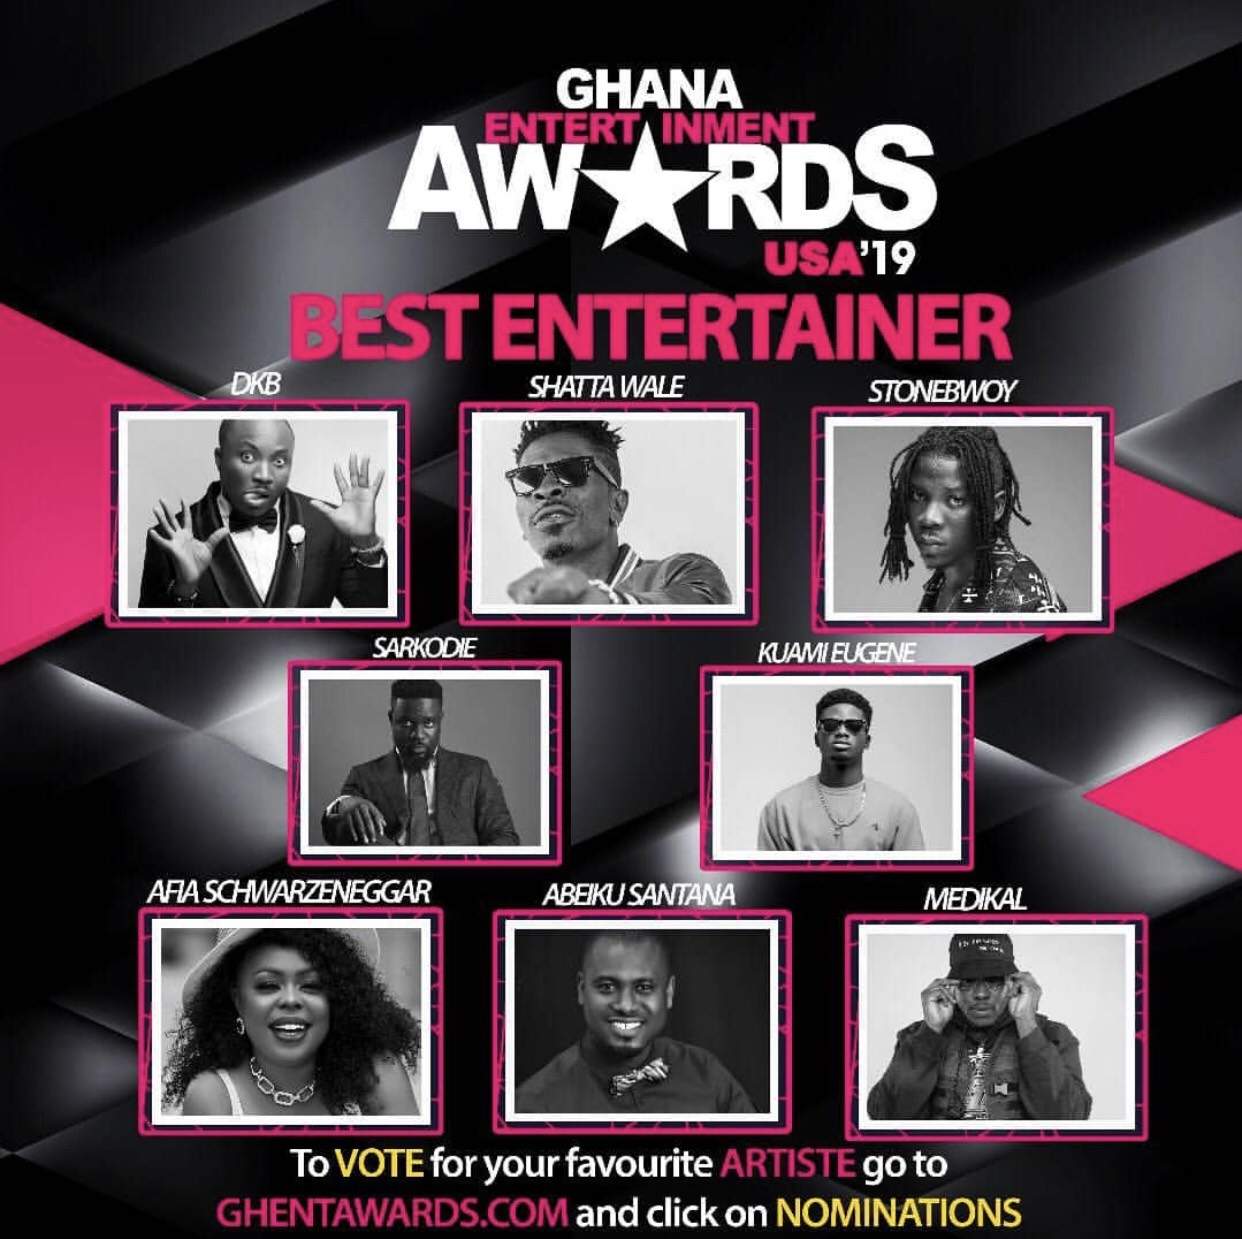 nominees for 2019 Ghana Entertainment Awards USA